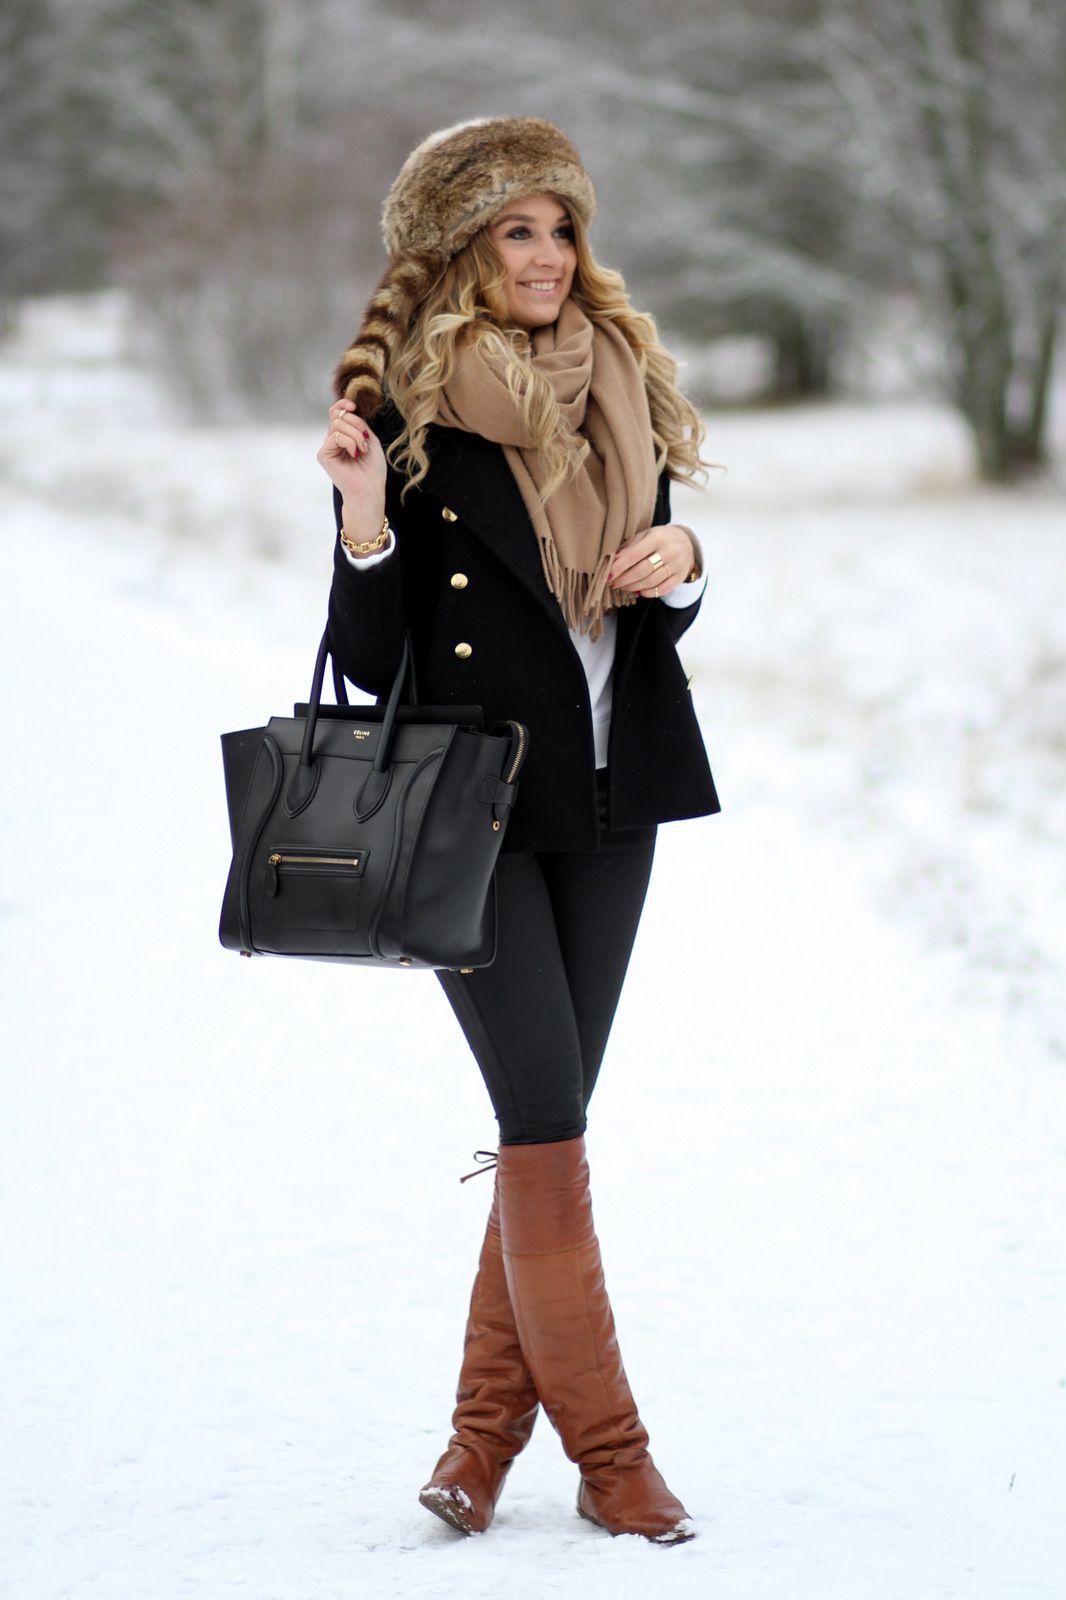 Bont http://www.rantapallo.fi/mungolife/2013/12/31/sudenpentu/  Black, Zara, OTK, ACNE, scarf, fur, hat, Celine, American Retro, fashion, outfit, blogger, Mungolife